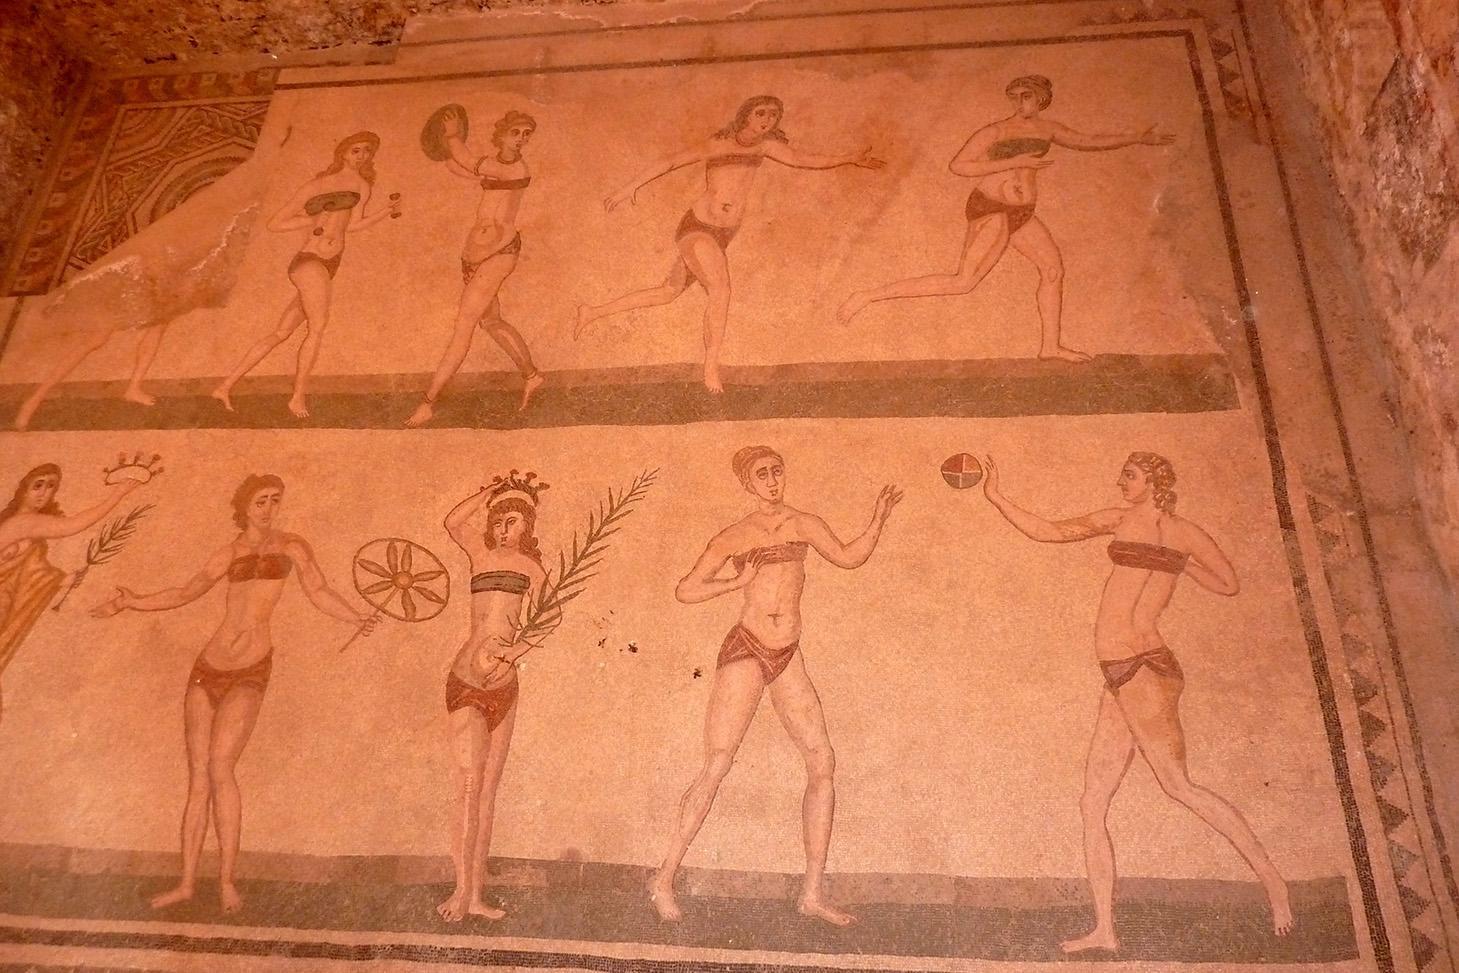 Sporting bikini girls